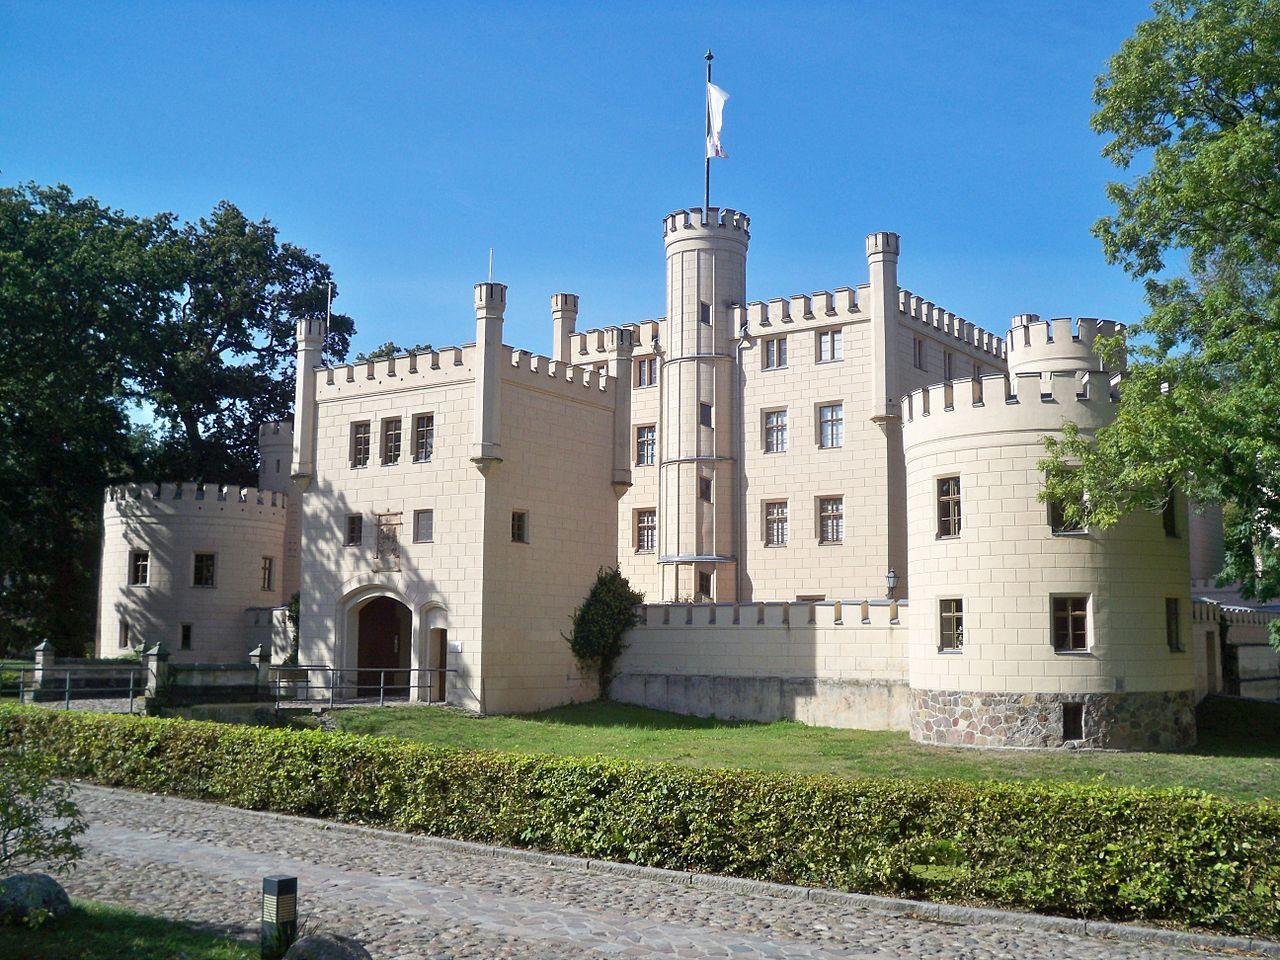 Bild Jagdschloss Letzlingen